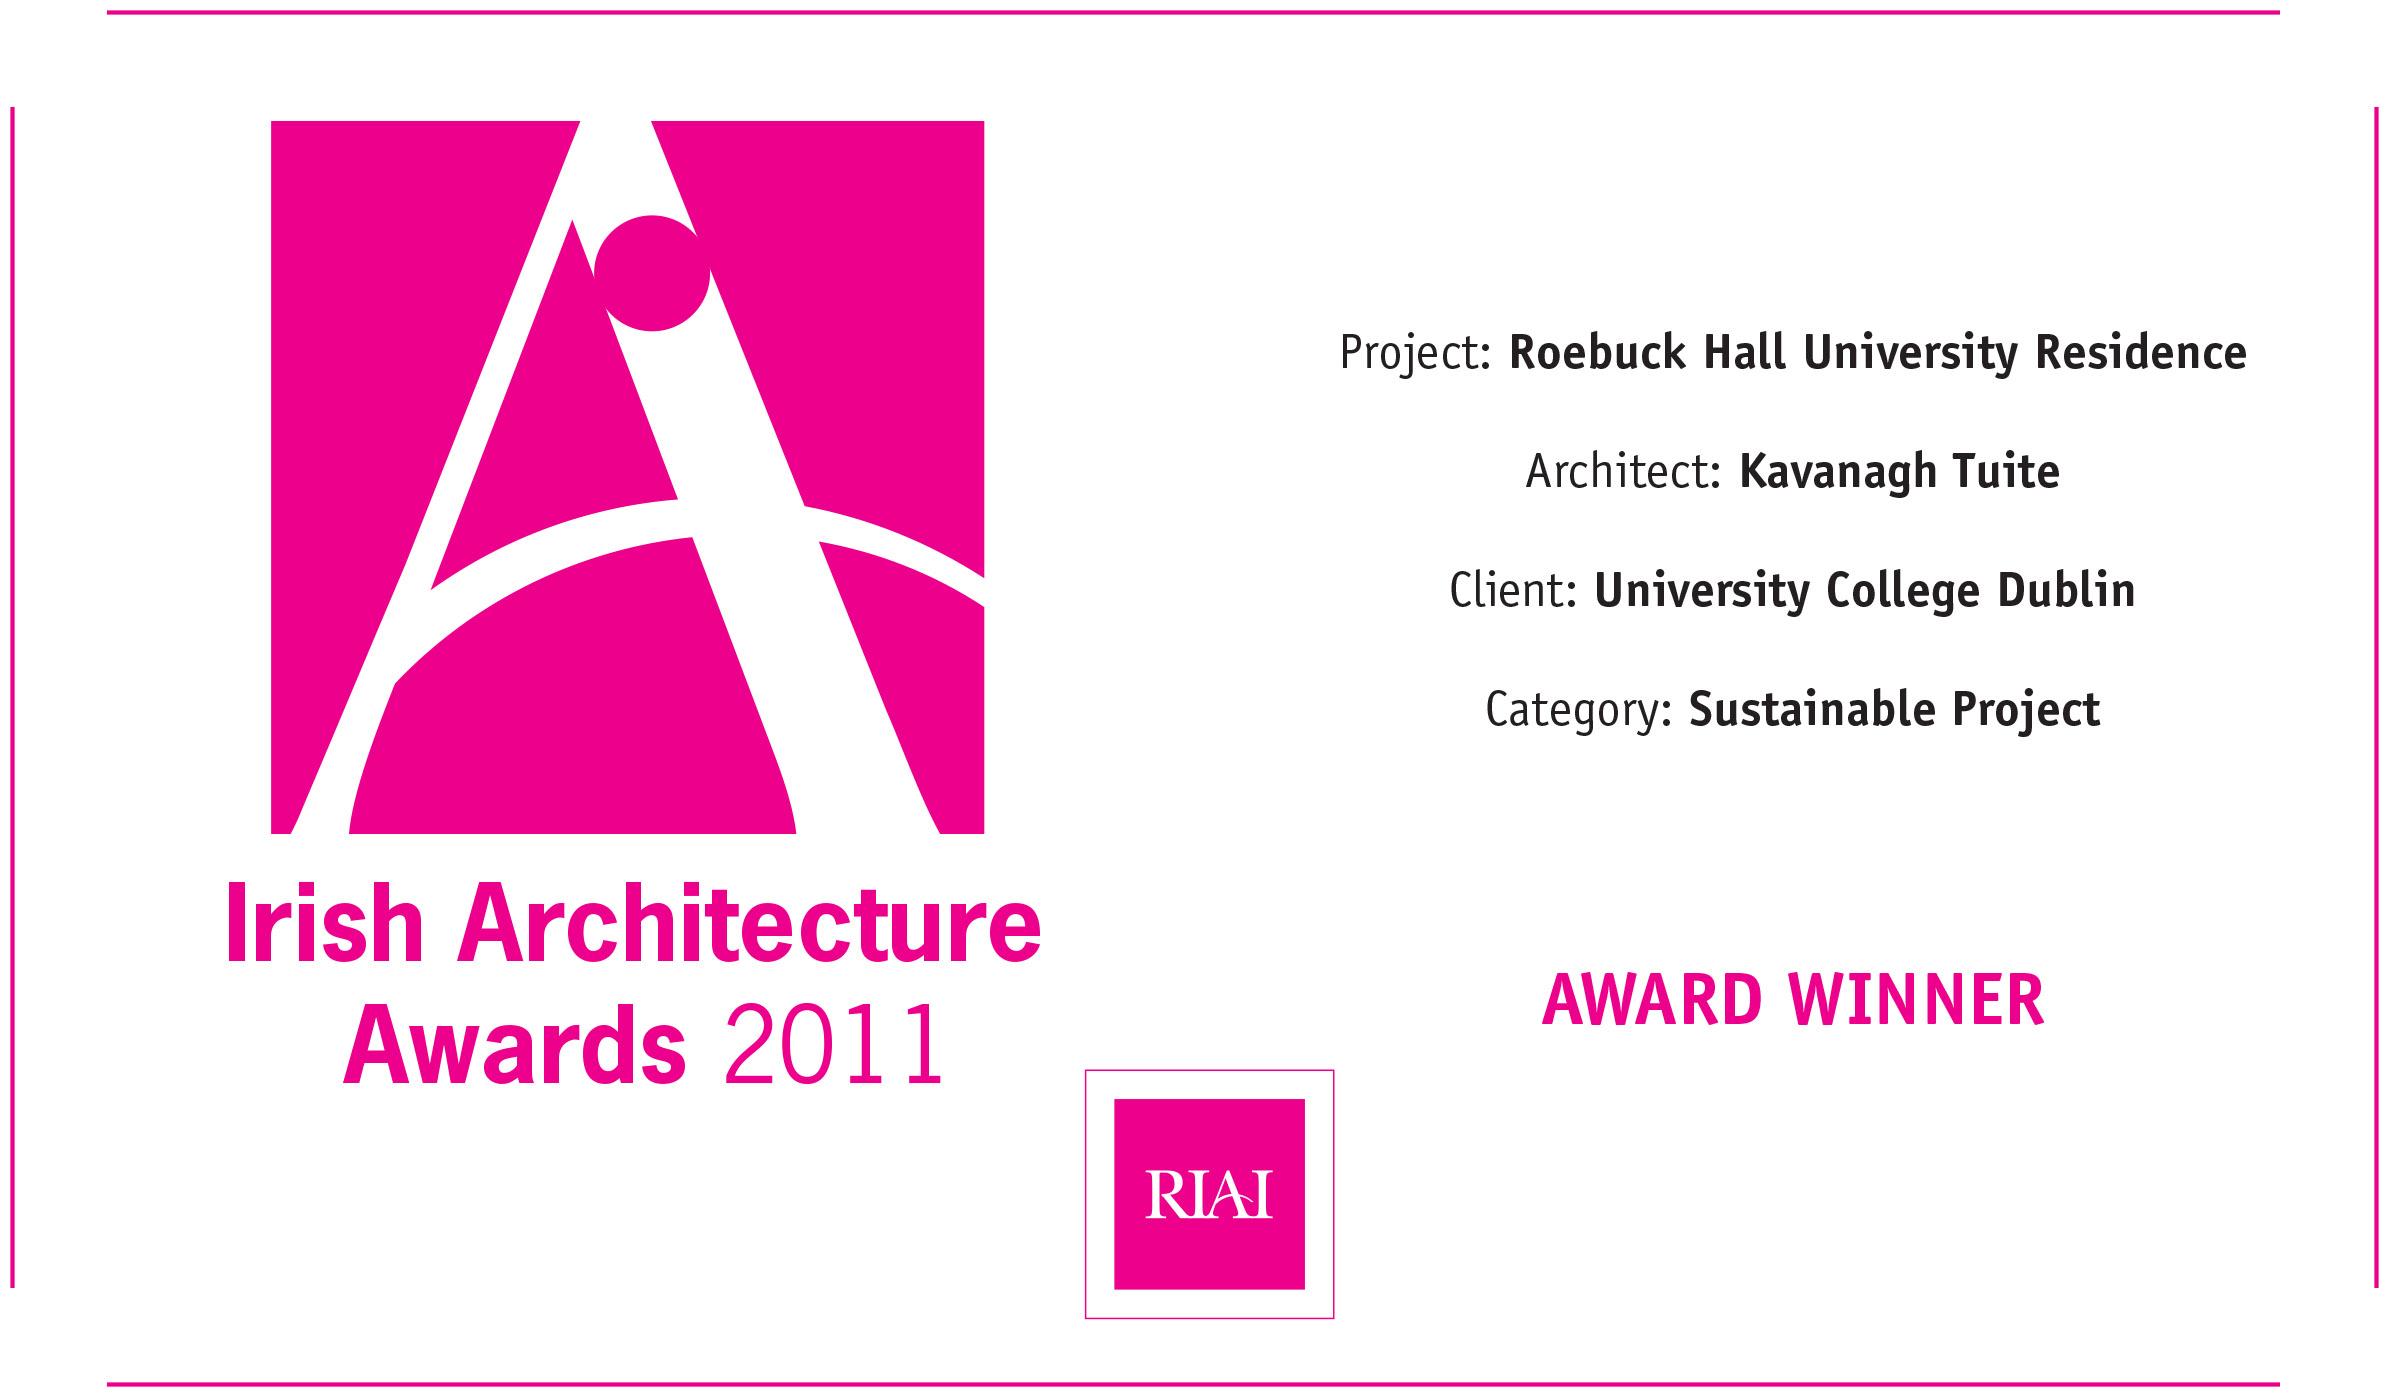 RIAI-plaques-2011KTsustainability.jpg